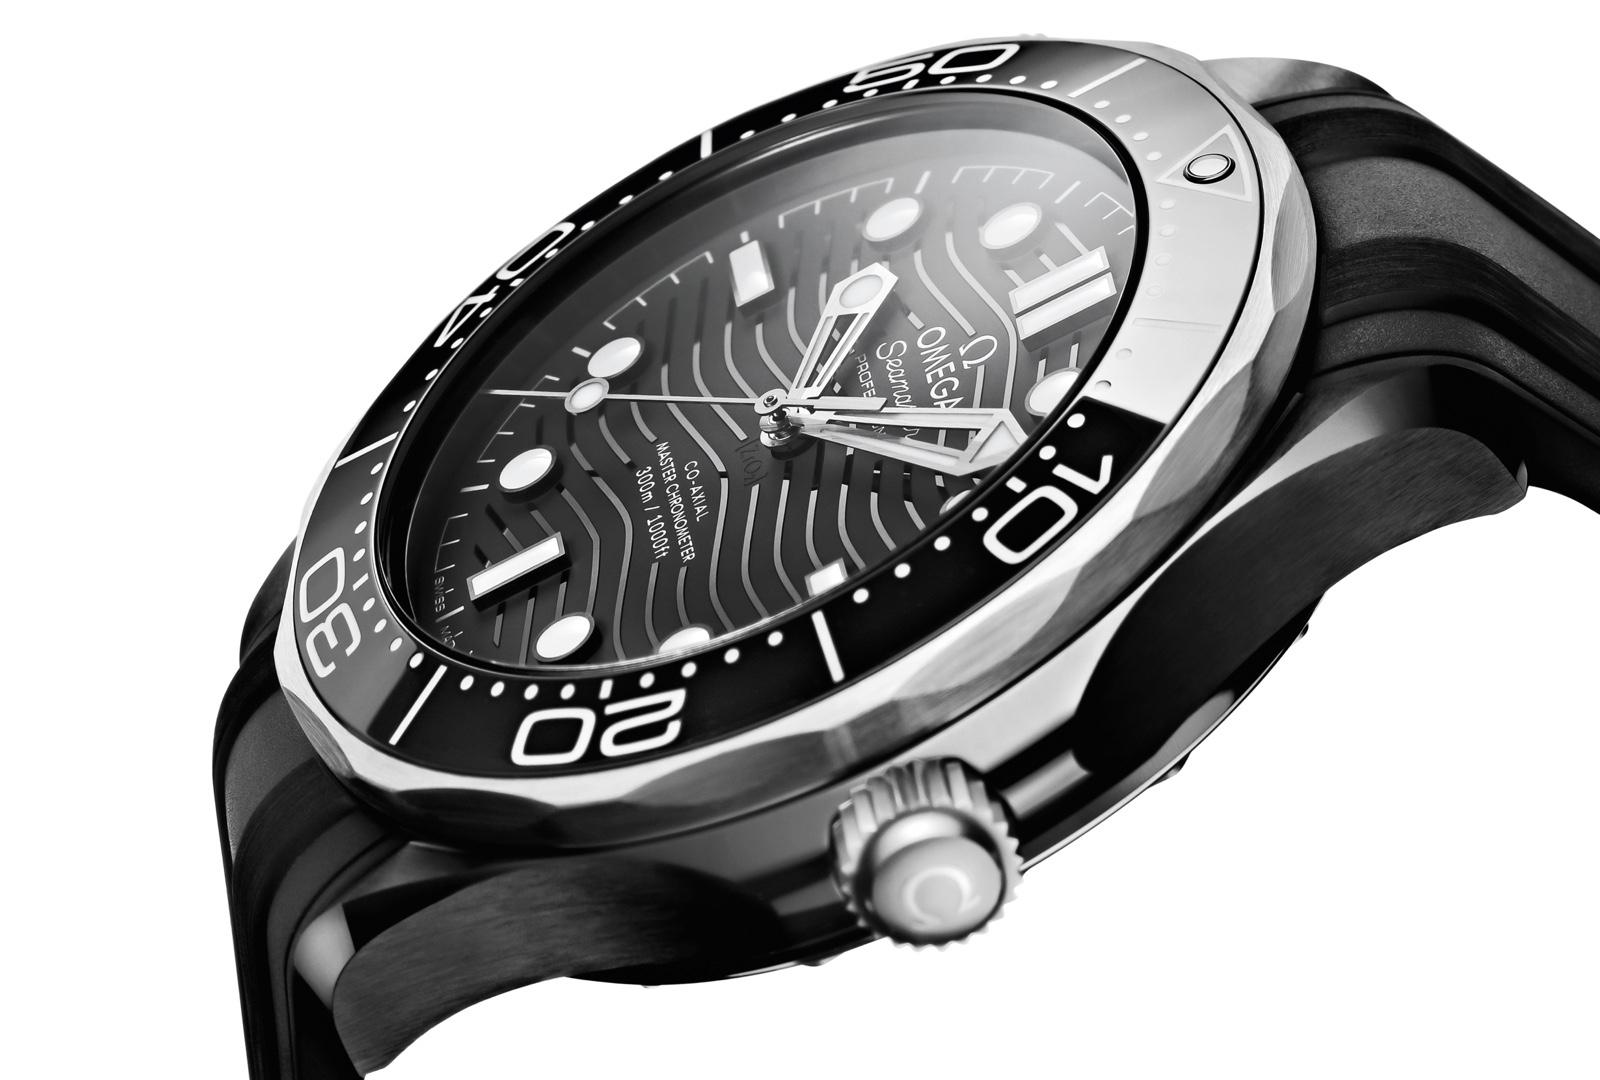 Omega Seamaster Diver 300M Cerámica Negra Titanio Profile